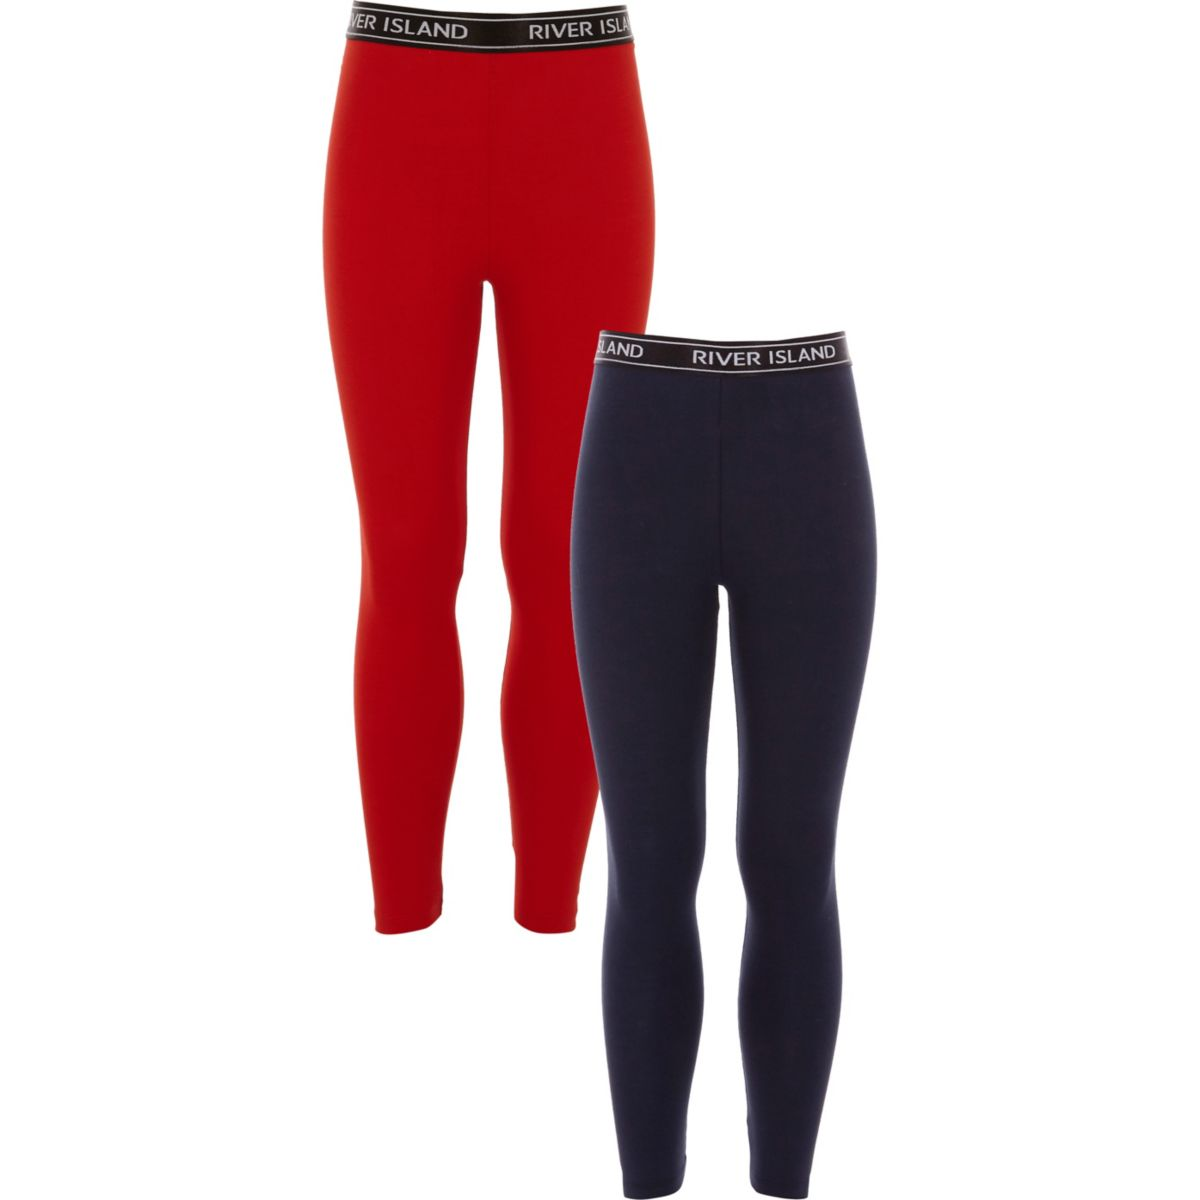 Girls navy and red leggings pack